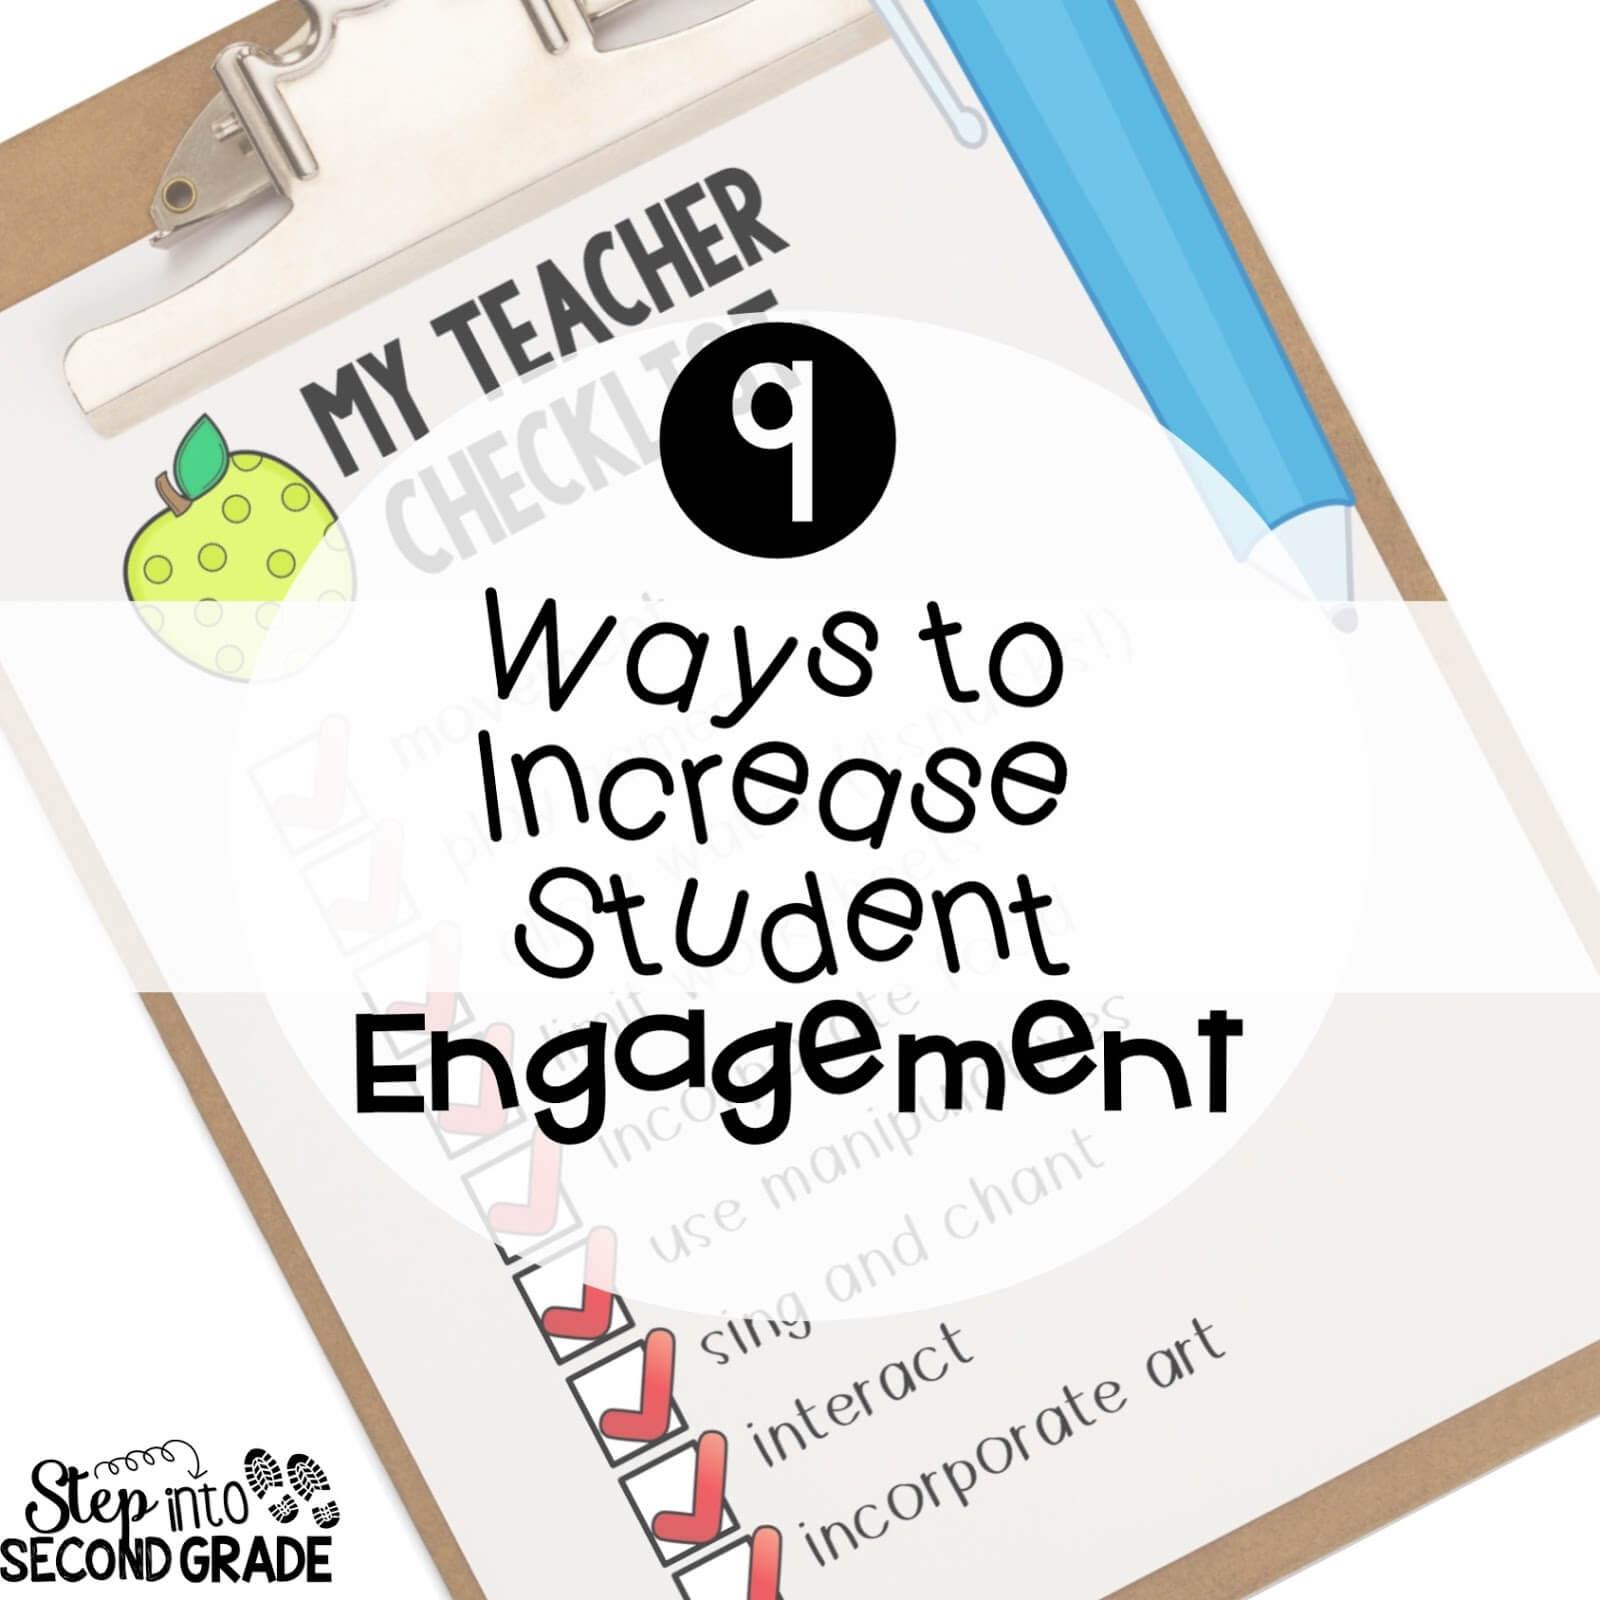 medium resolution of 9 Ways to Increase Student Engagement - Amy Lemons